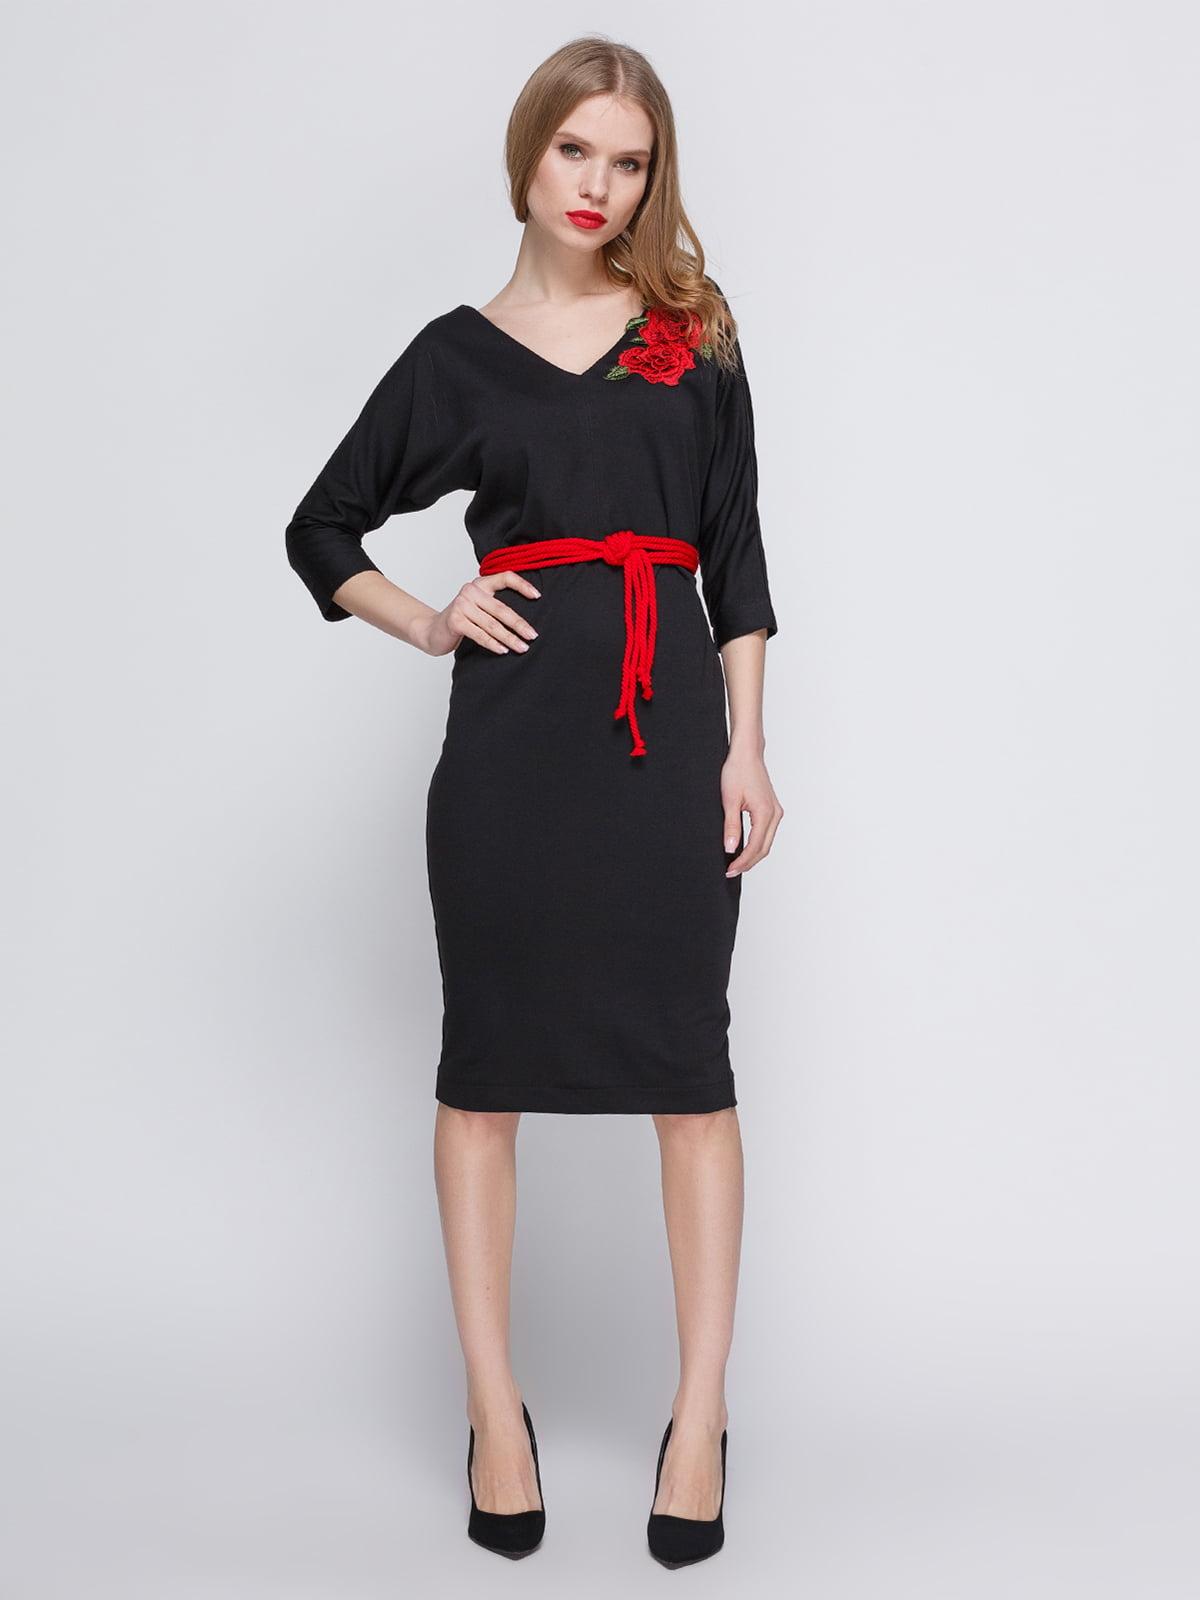 Сукня чорна з аплікацією і поясом | 3486511